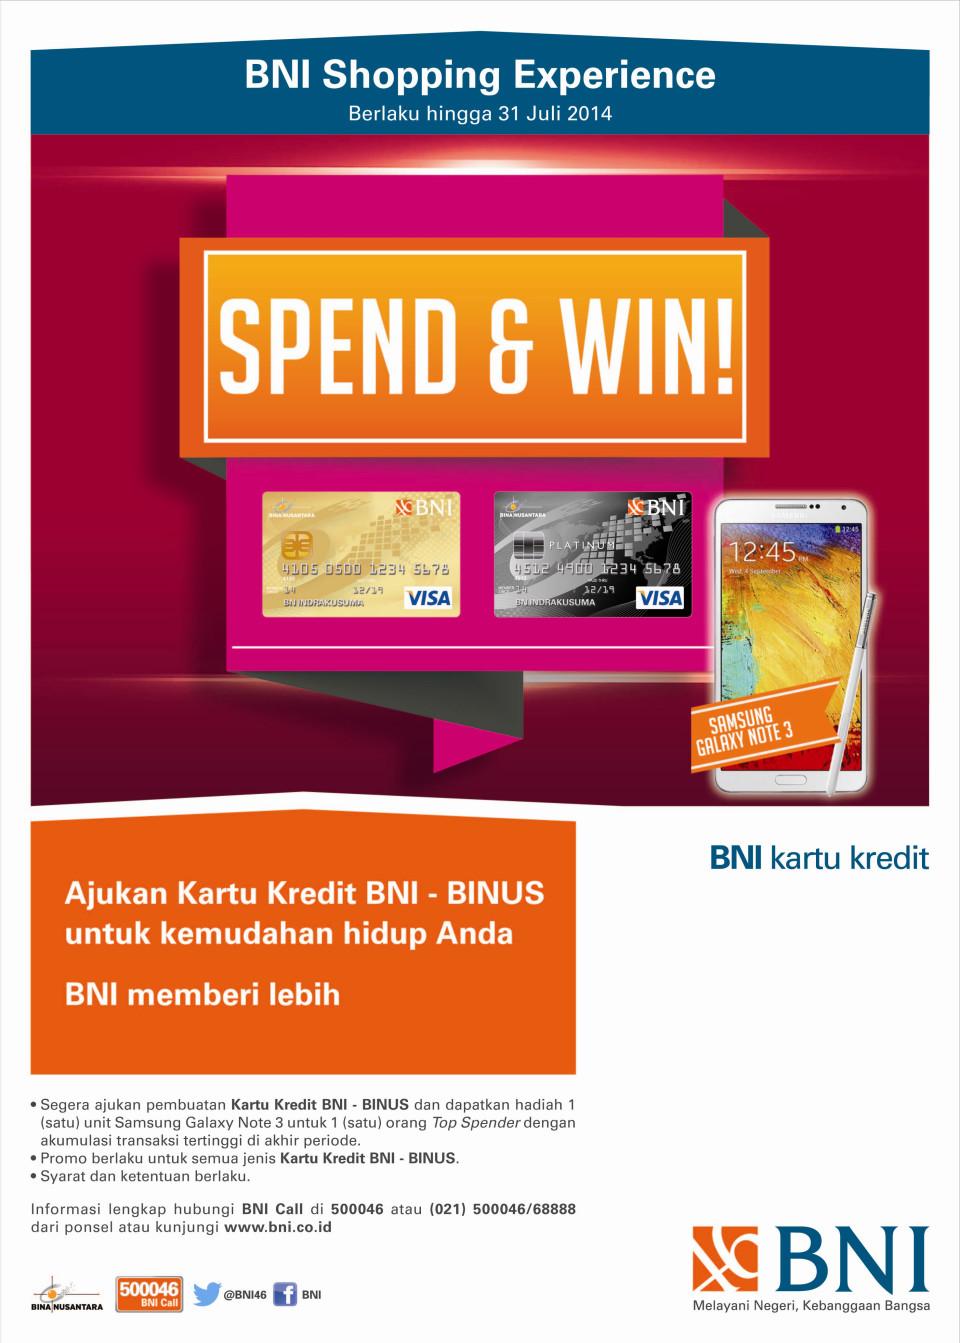 SPEND & WIN! WITH BNI - BINUS CREDIT CARD